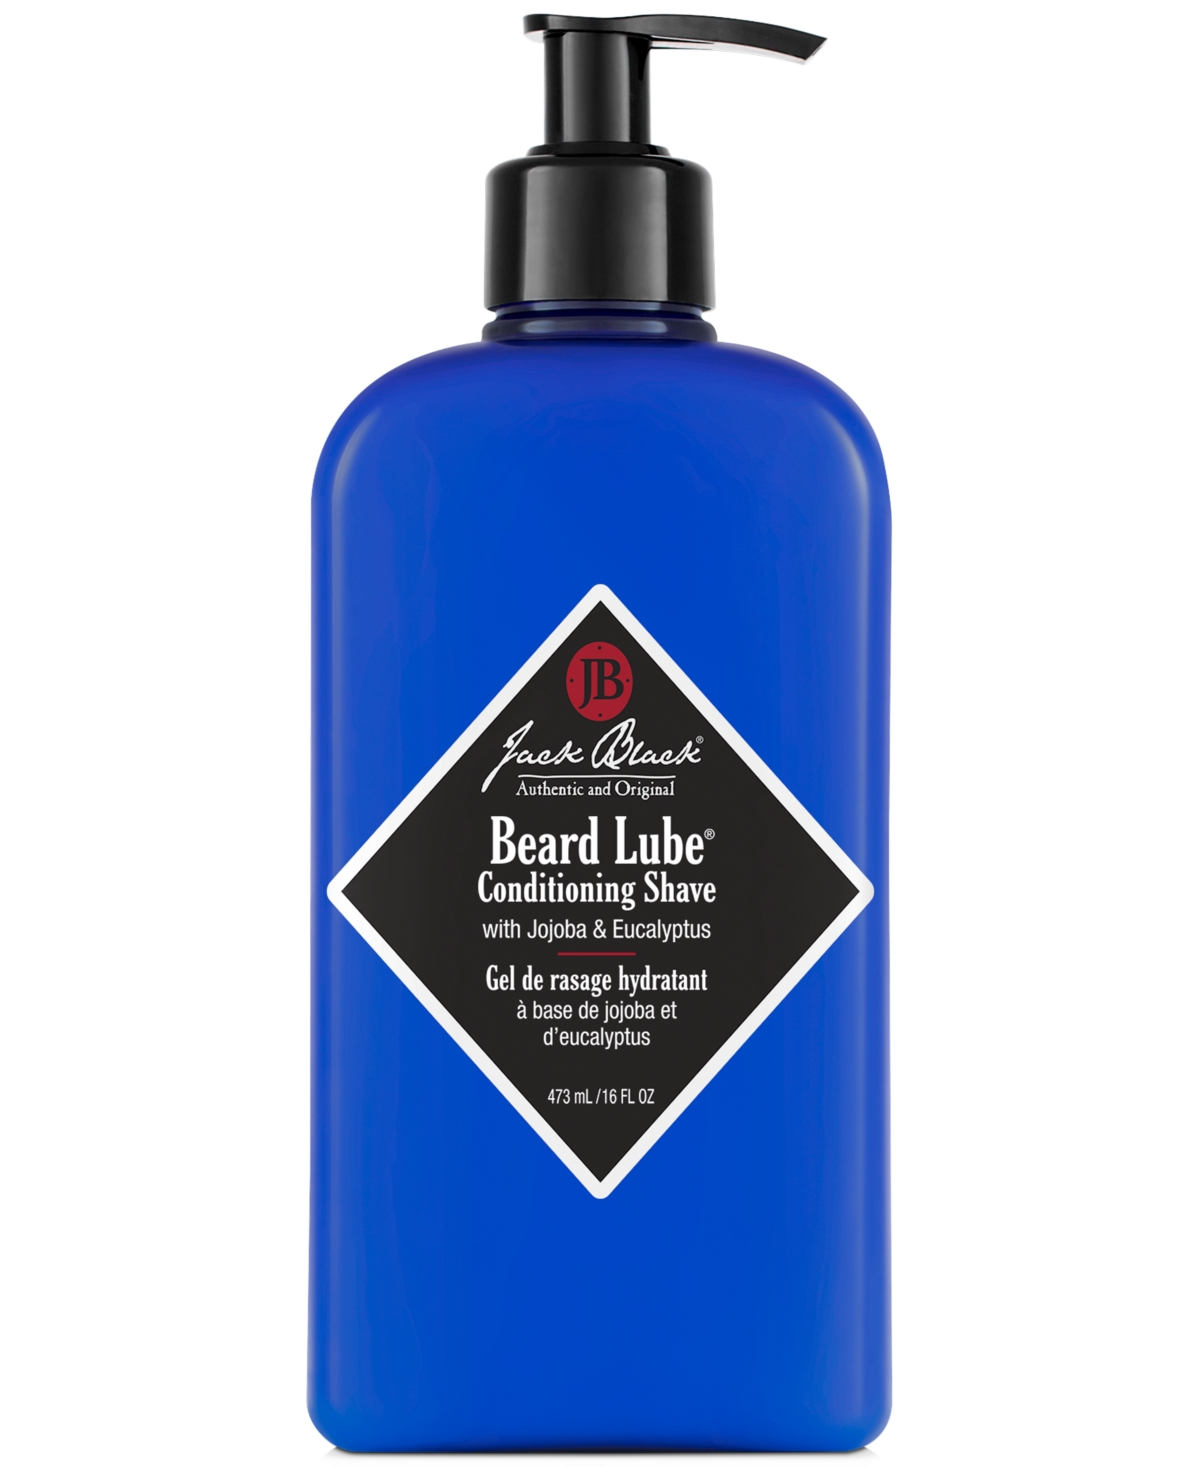 Jack Black Beard Lube Conditioning Shave, 16 oz.